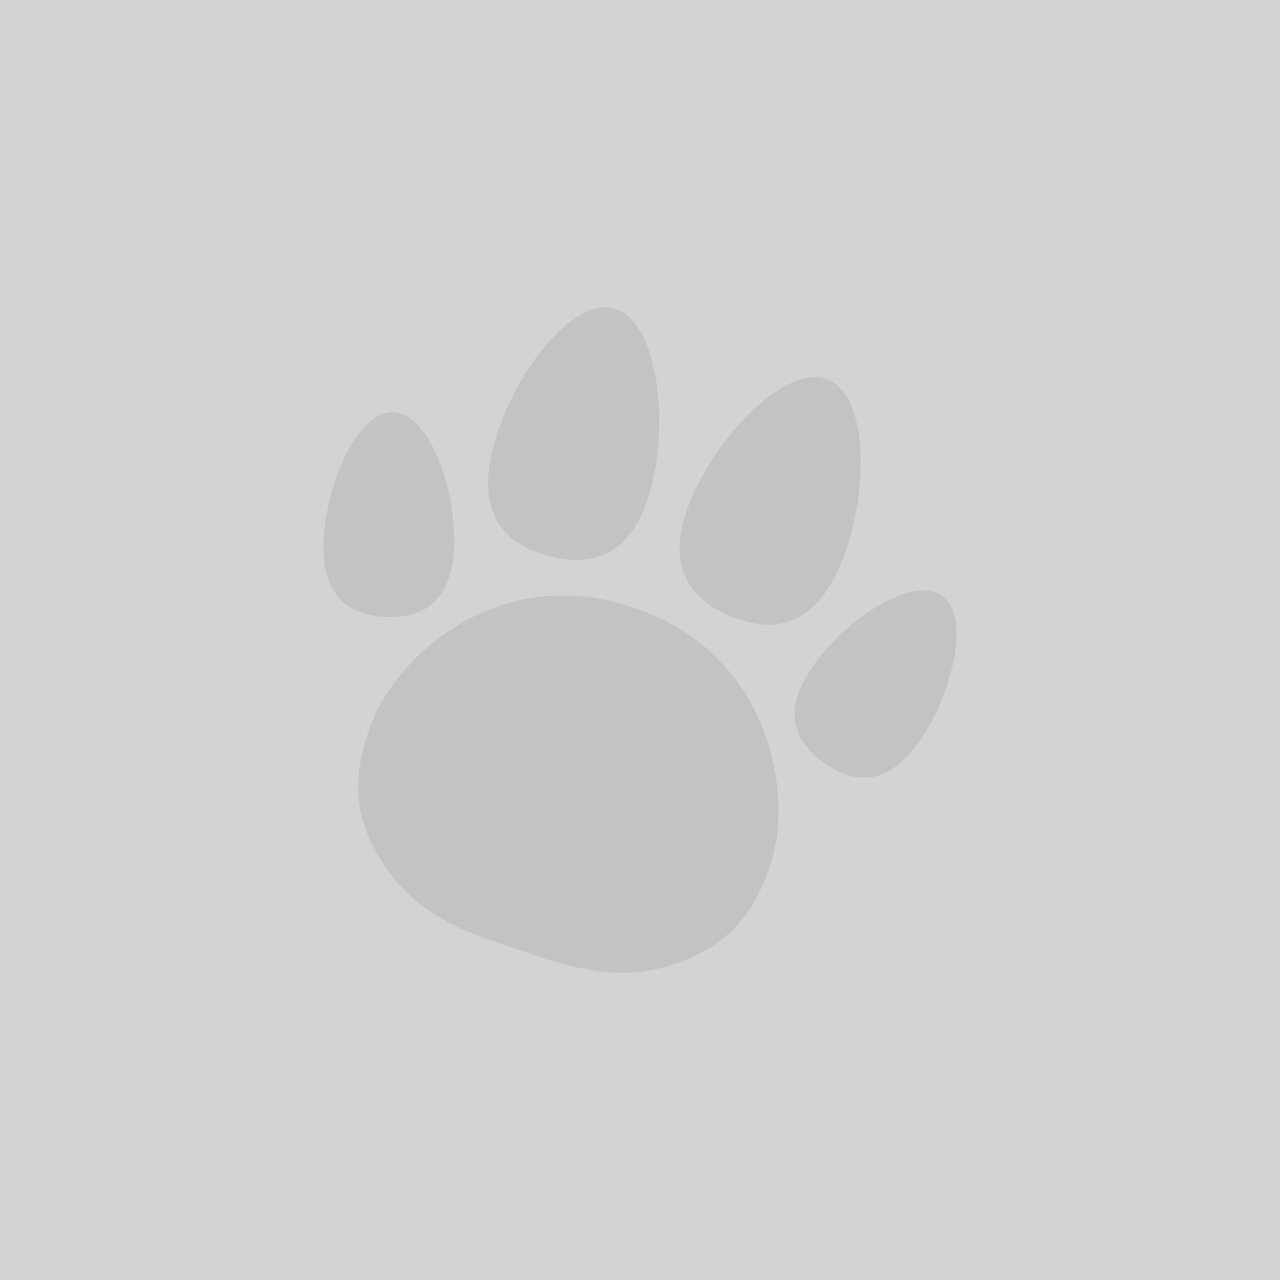 Flexi Classic Retractable Cord Medium Dog Lead 5m - Red